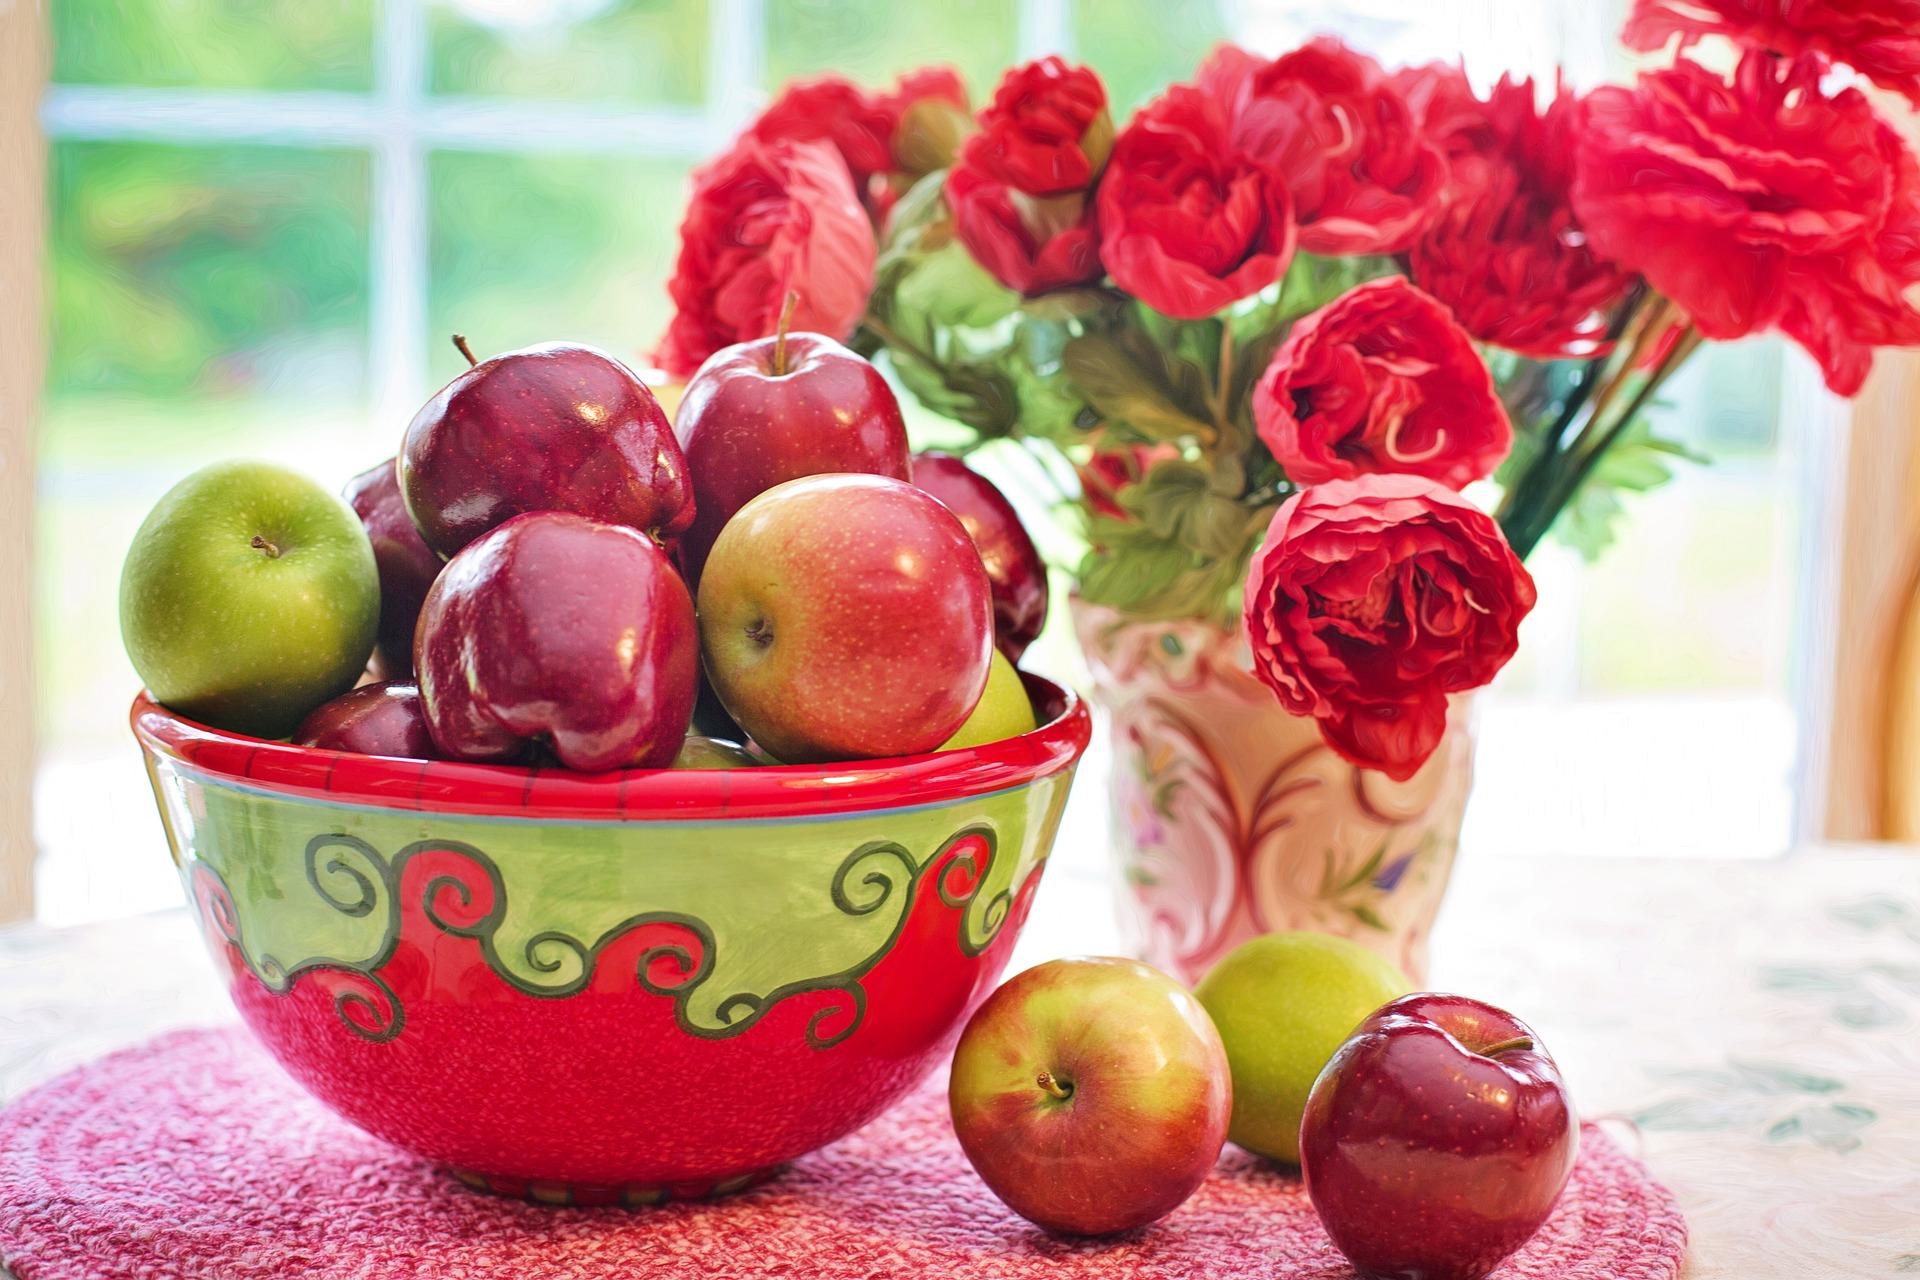 apples 2906457 1920